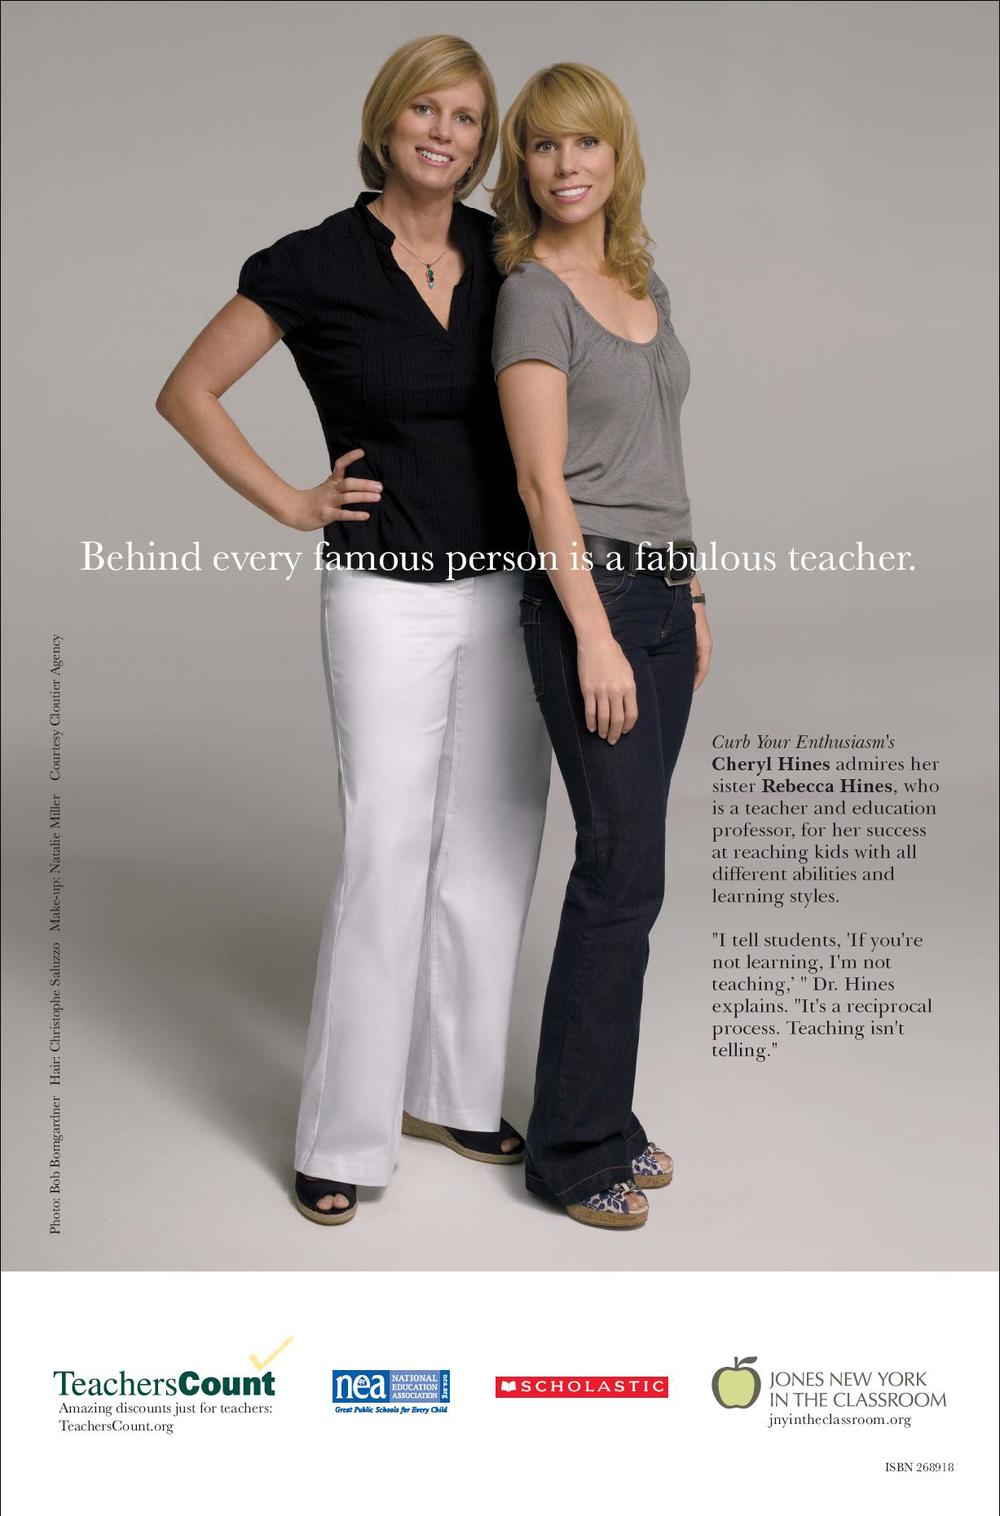 Hines, Cheryl - poster.JPG